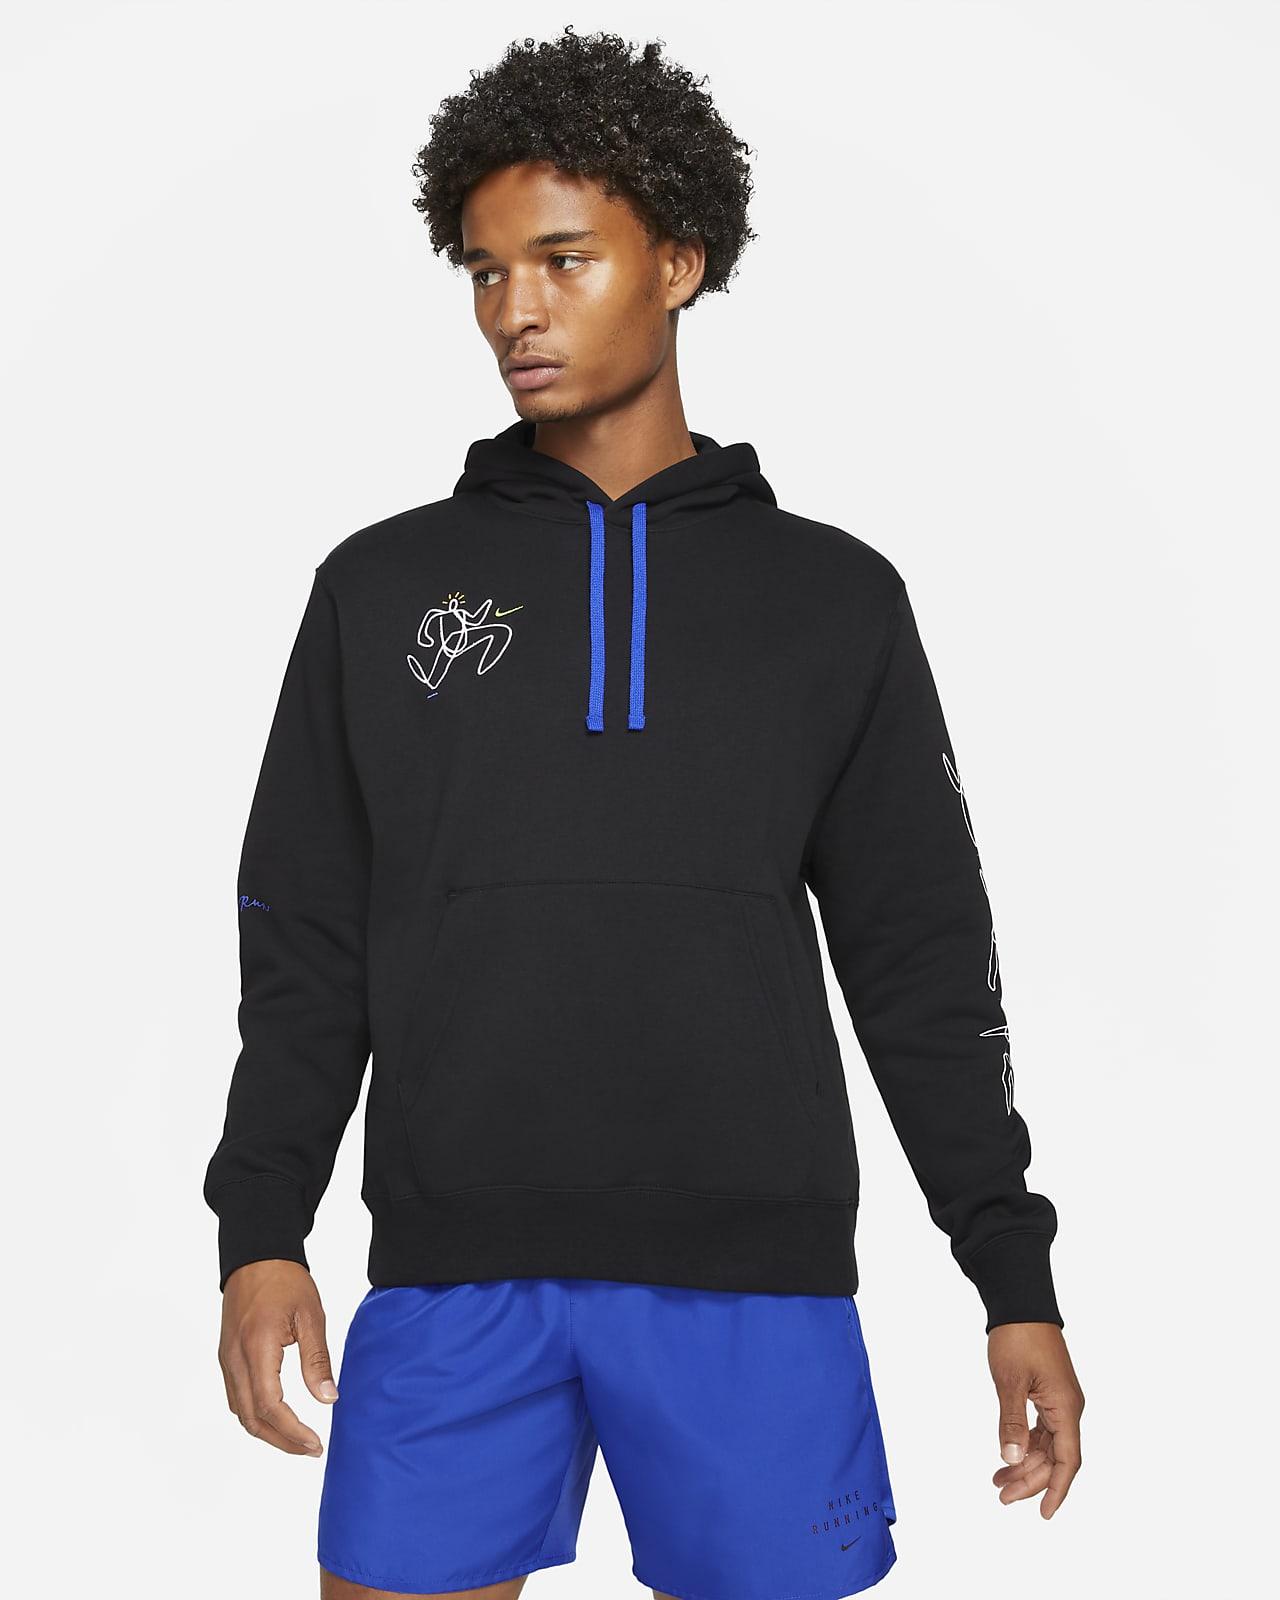 Nike Hackney Club Fleece-Lauf-Hoodie für Herren